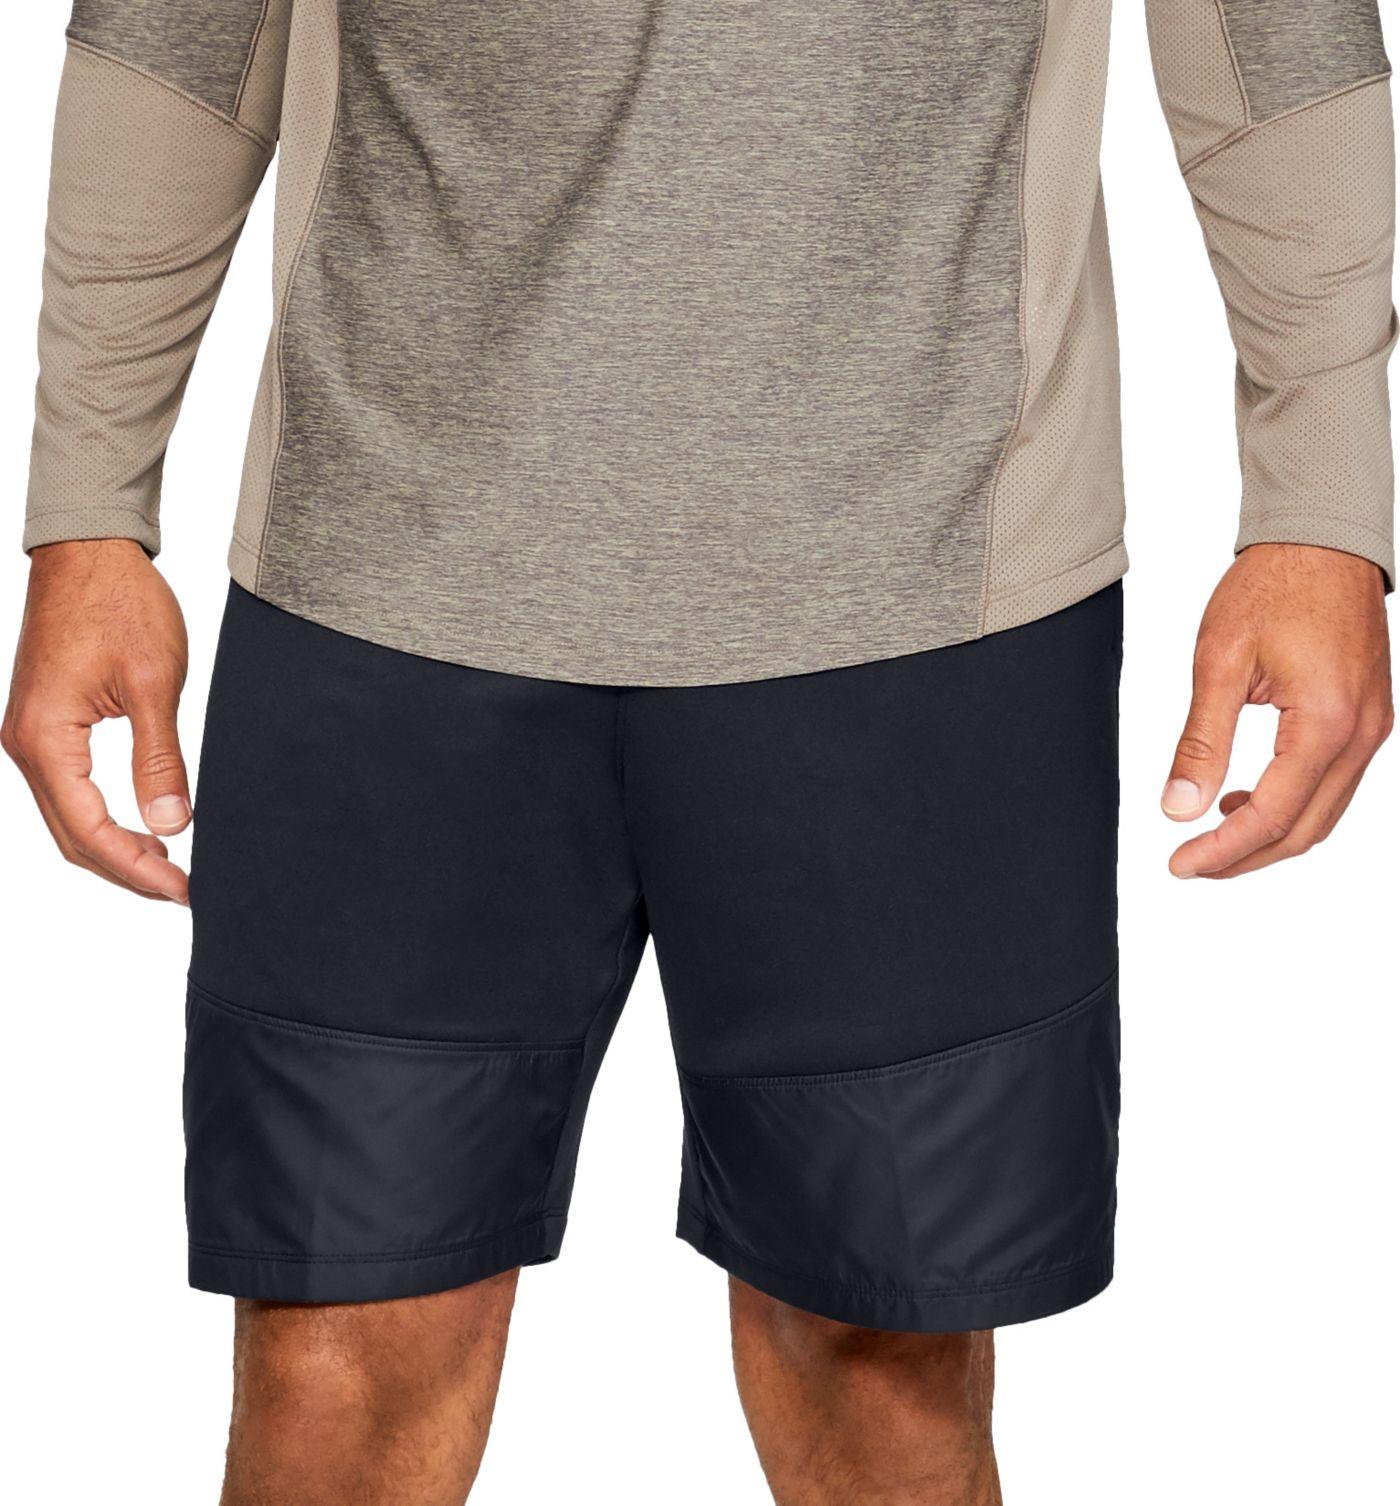 Under Armour Men's MK-1 Shorts (Regular and Big & Tall)